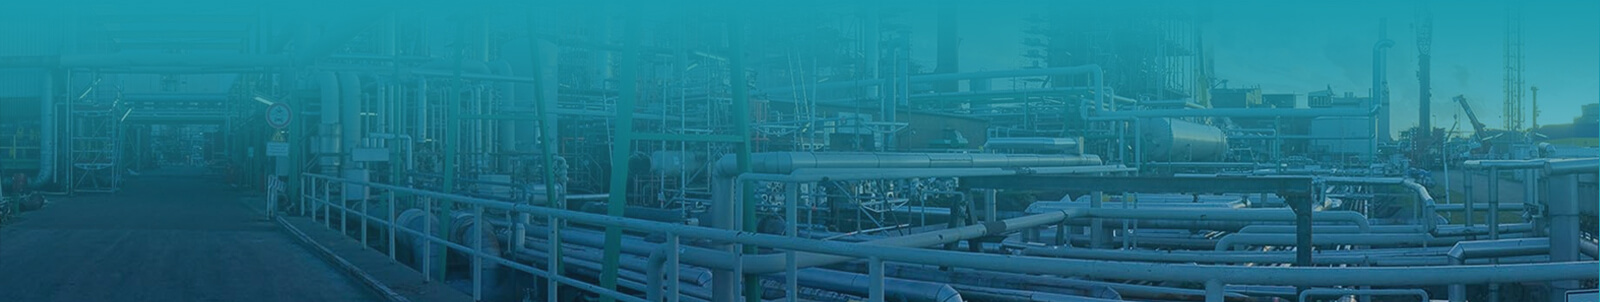 Industrial Filters Manufacturer